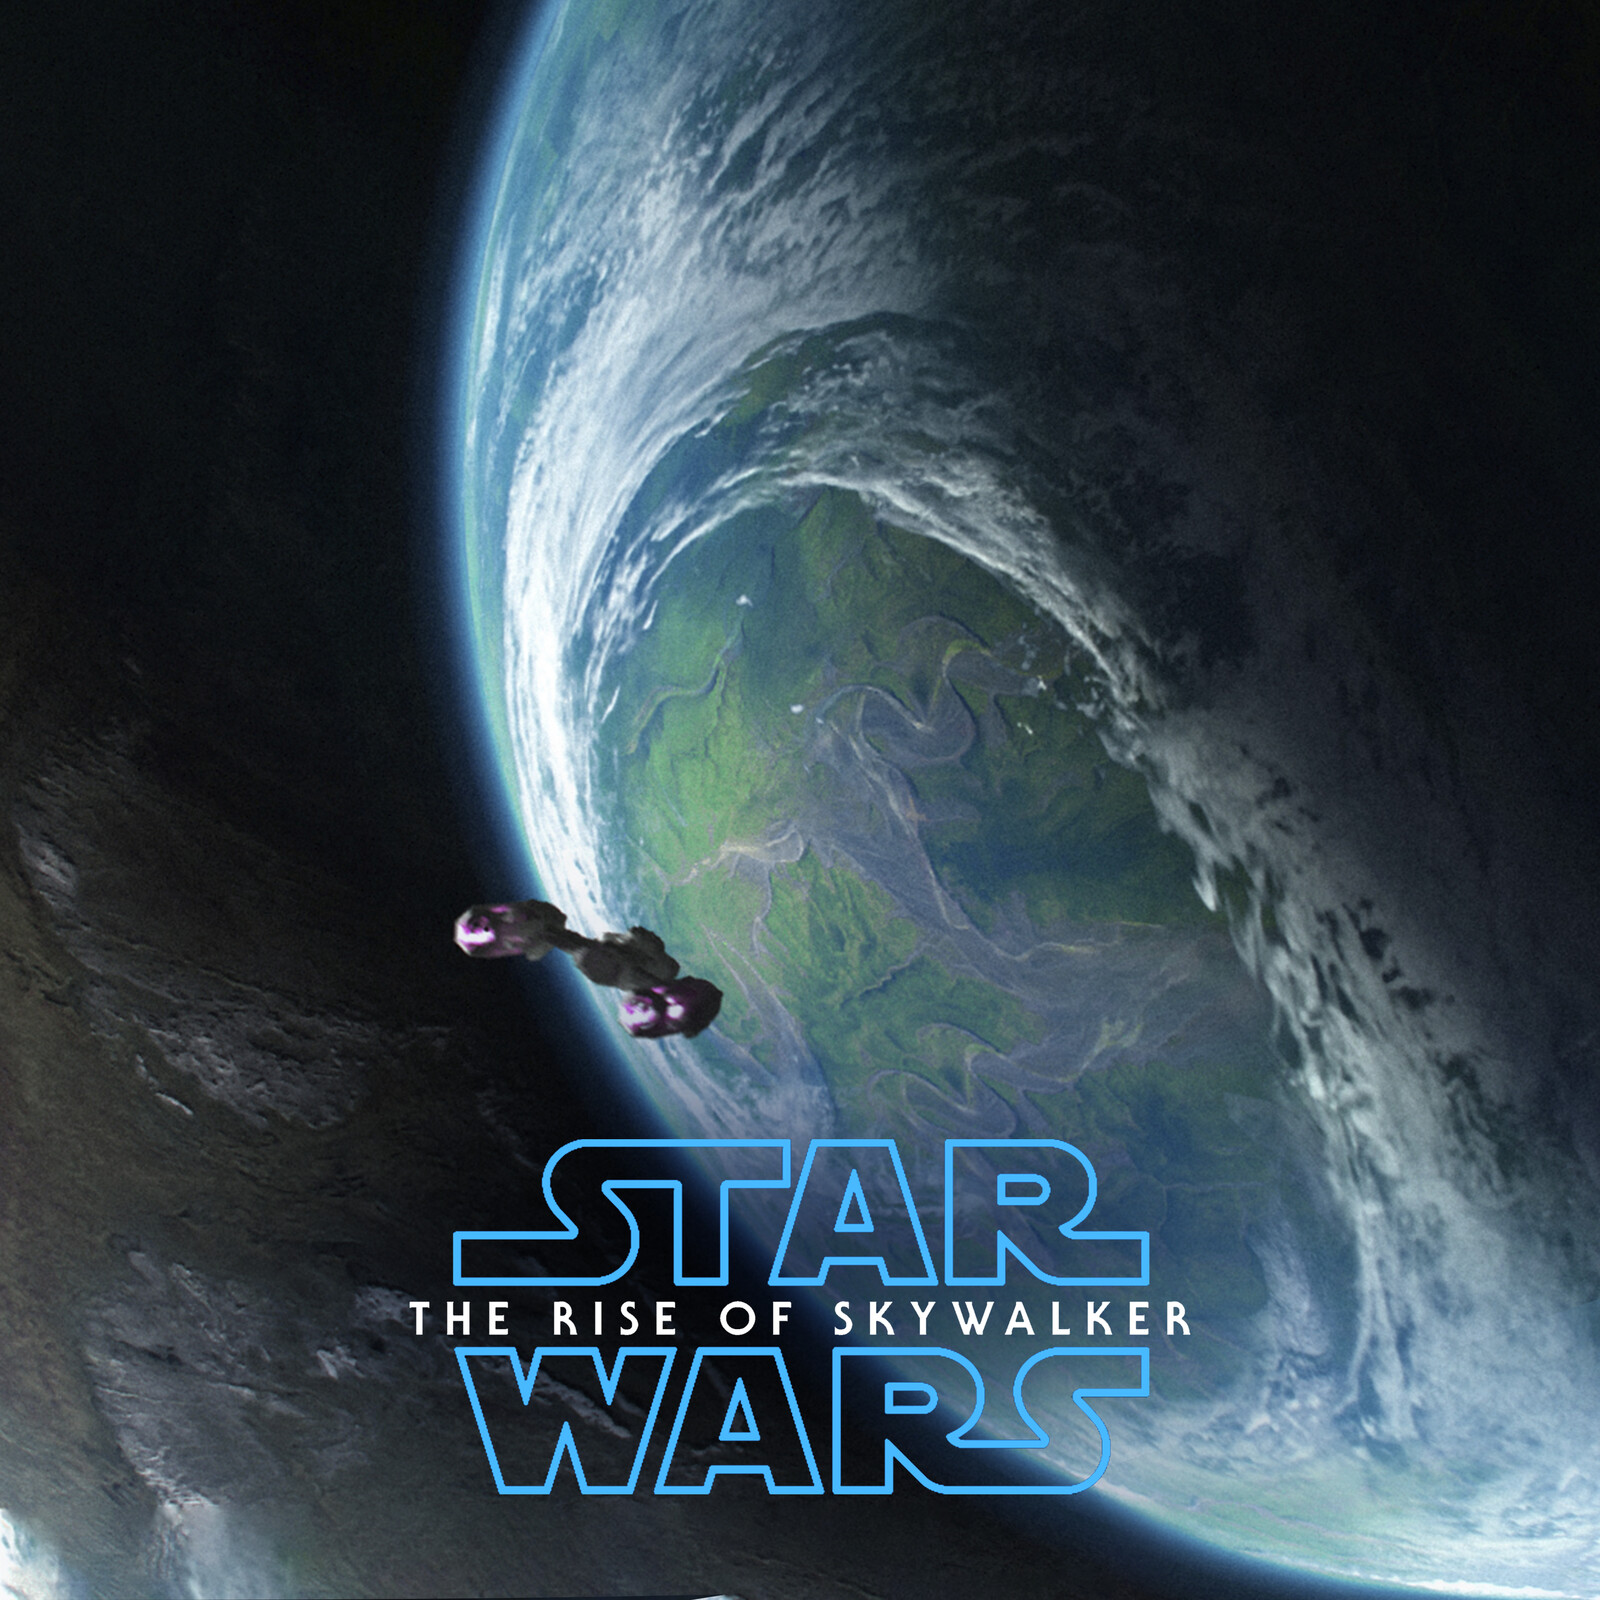 STAR WARS Episode IX / Ajan Kloss